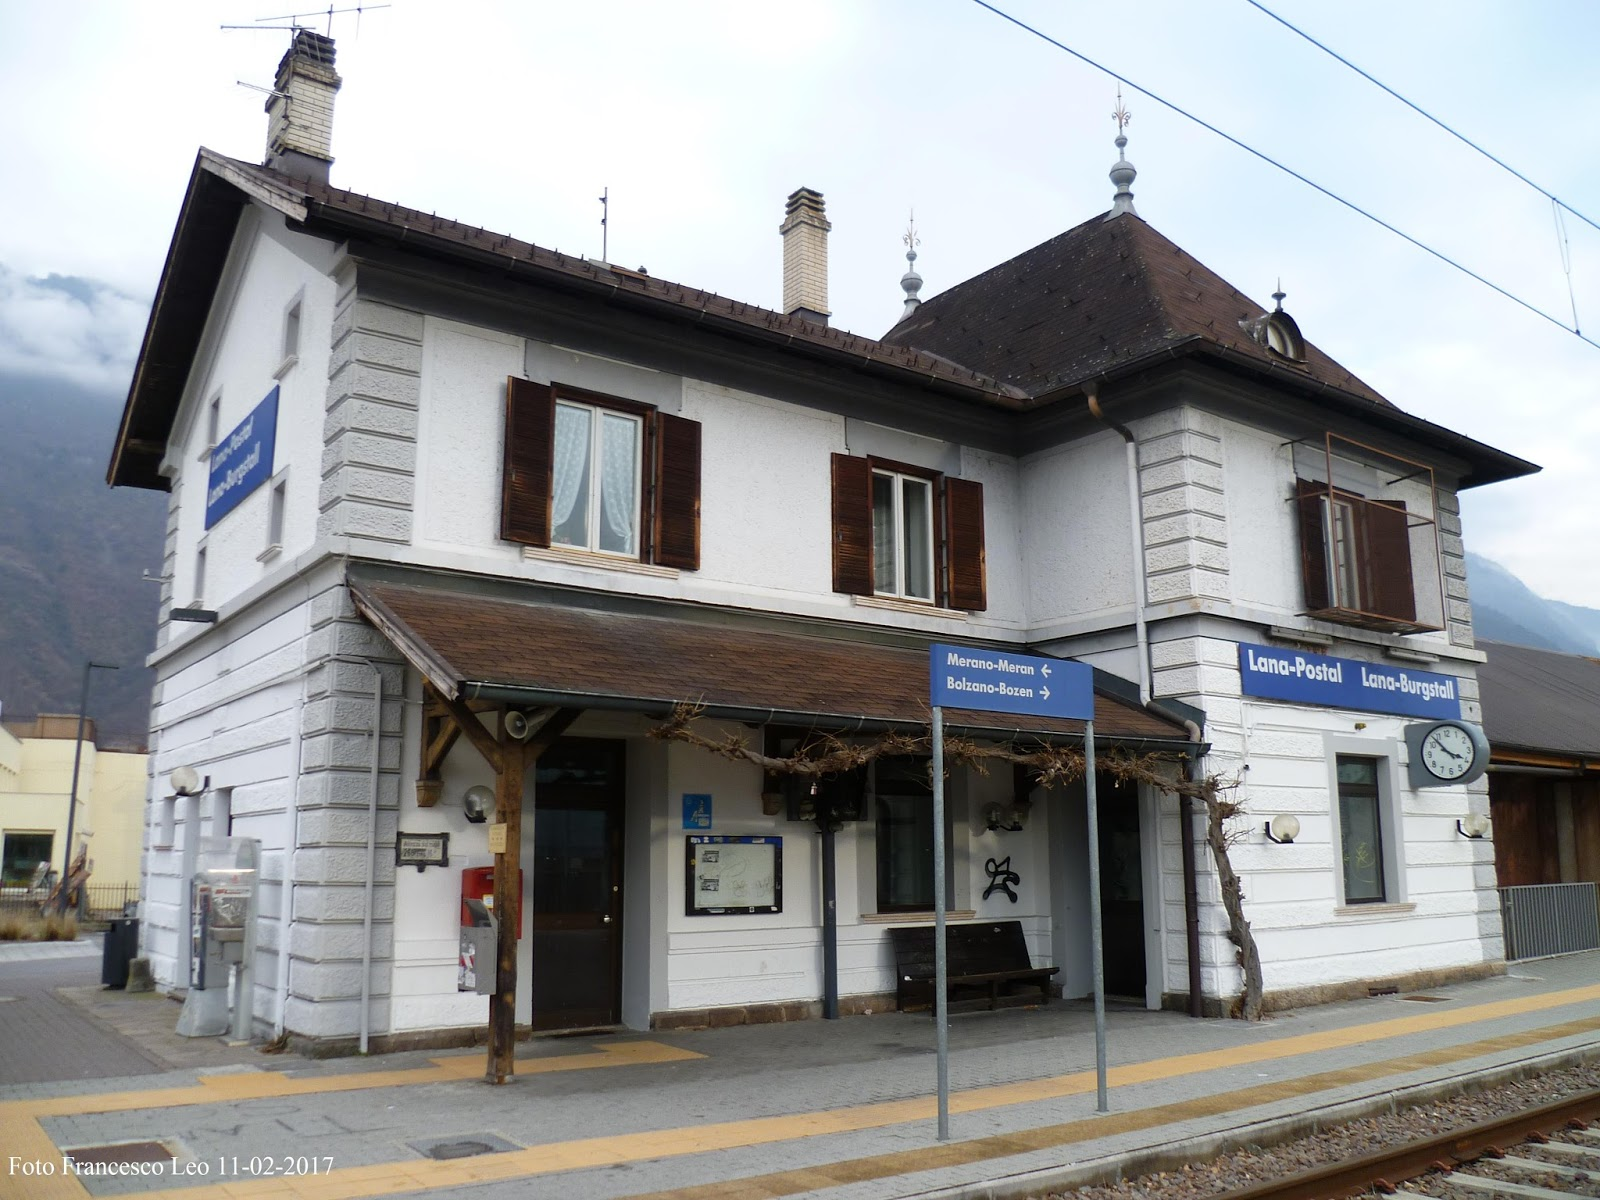 Comune Di Lana Bz la ferrovia lana postal